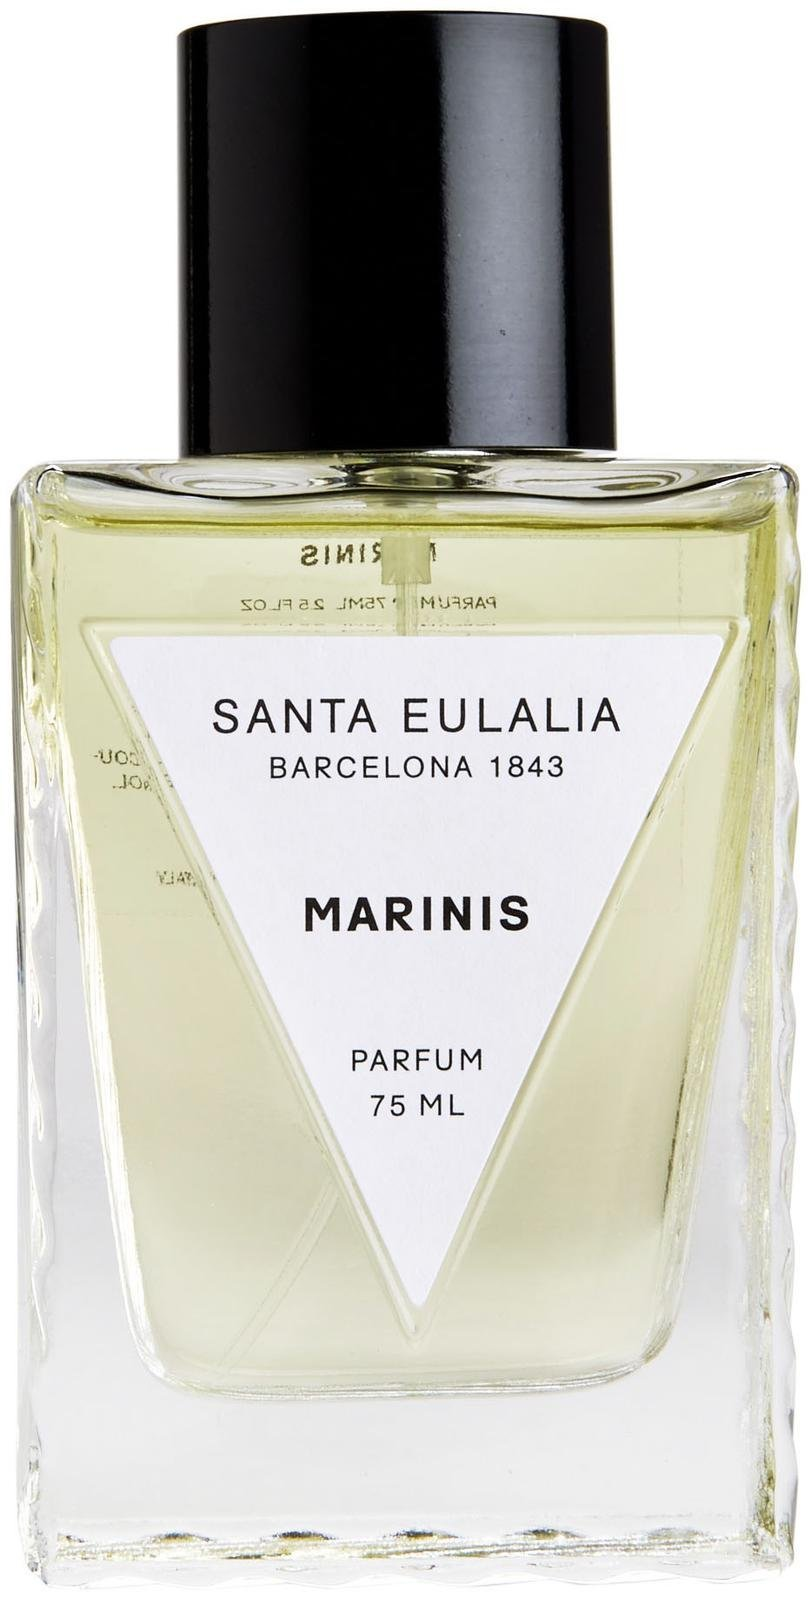 Santa Eulalia Parfum - Marinis - 2.5